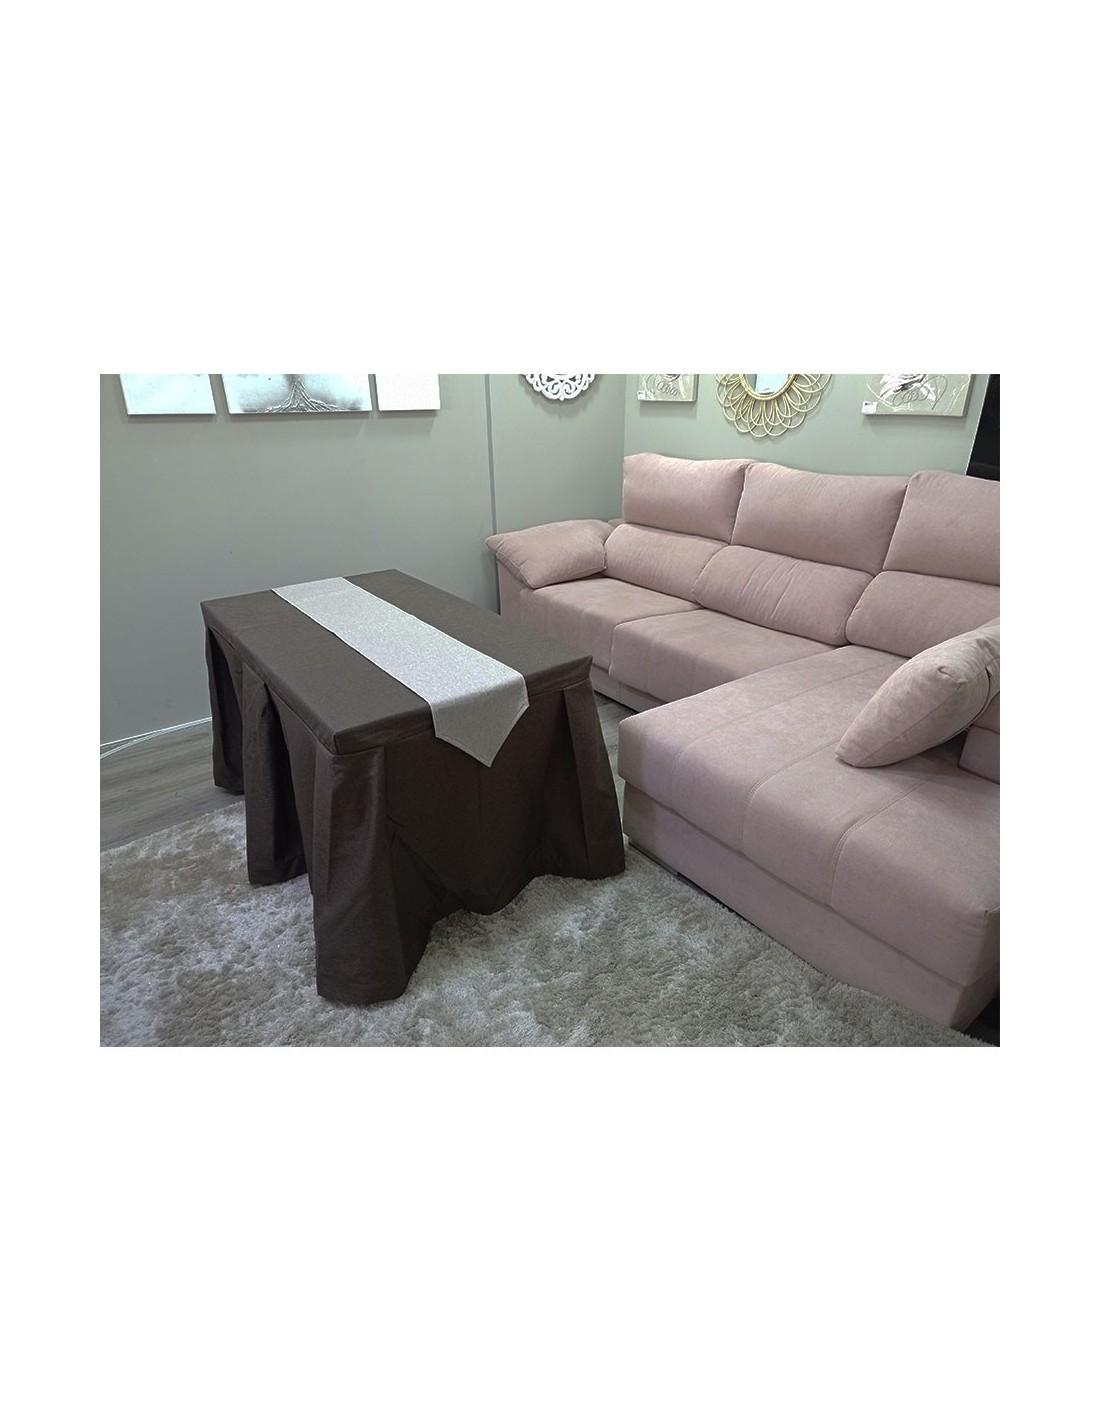 Amueblar piso completo madrid opcin with amueblar piso - Amuebla tu piso completo ...